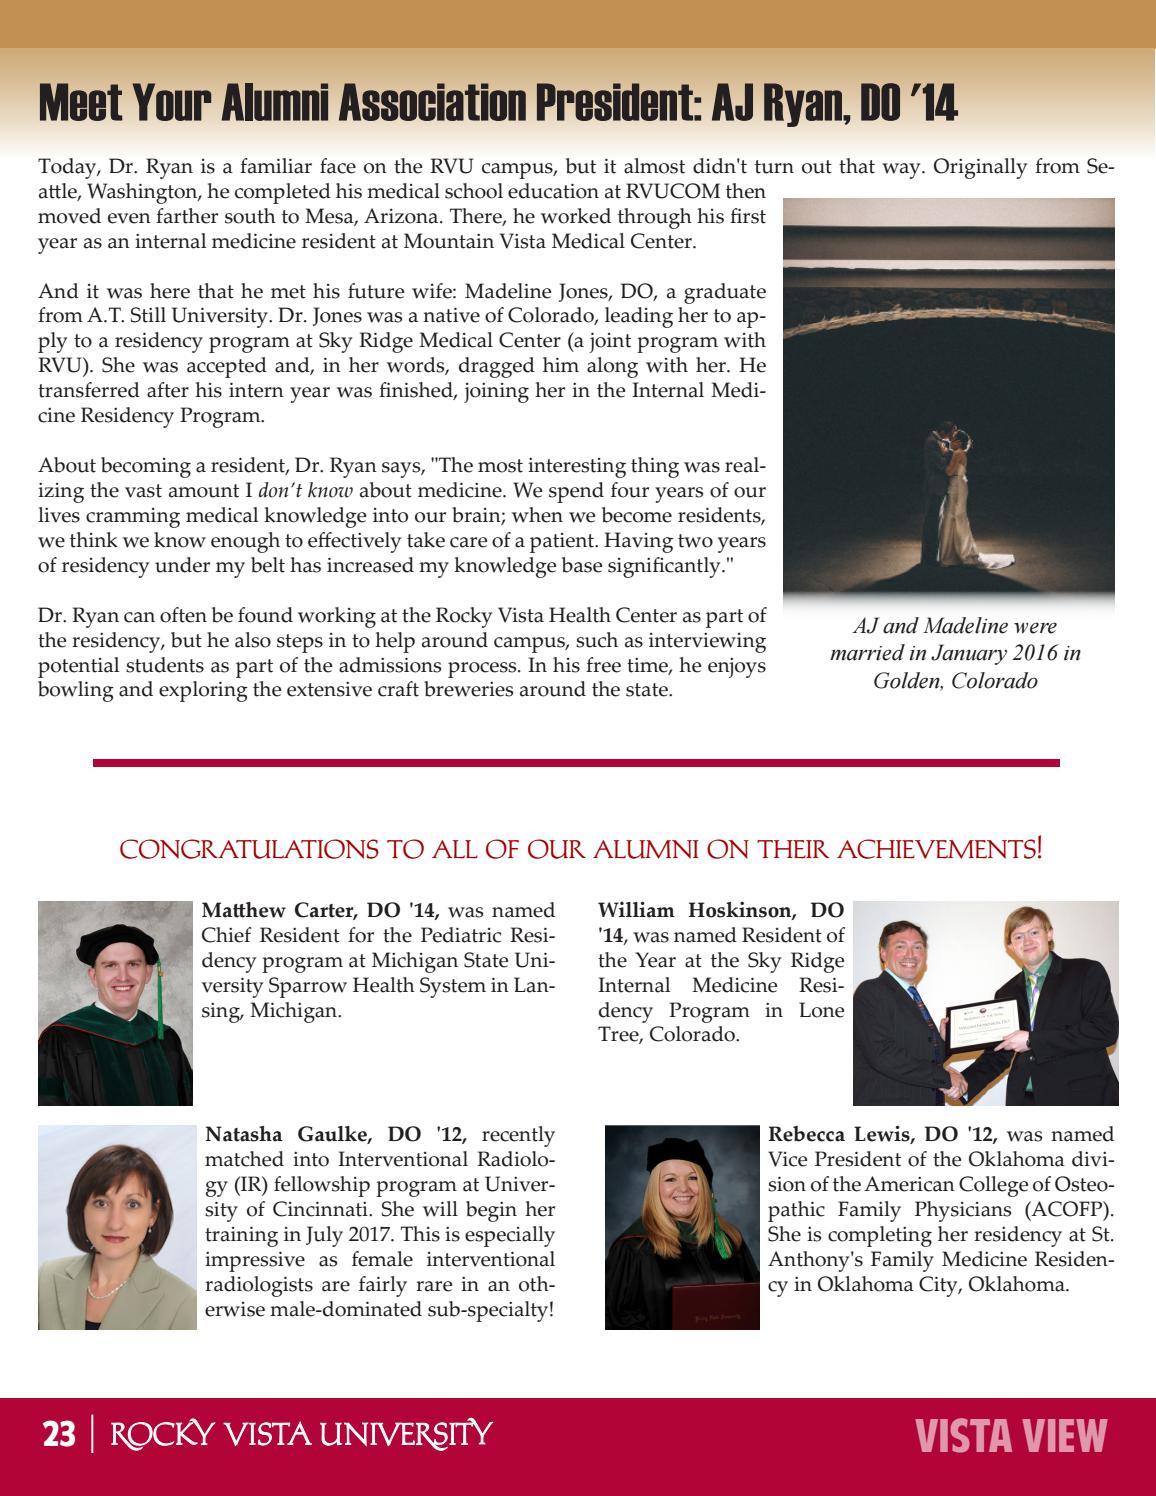 Rocky Vista University's Vista View Newsletter - June 2016